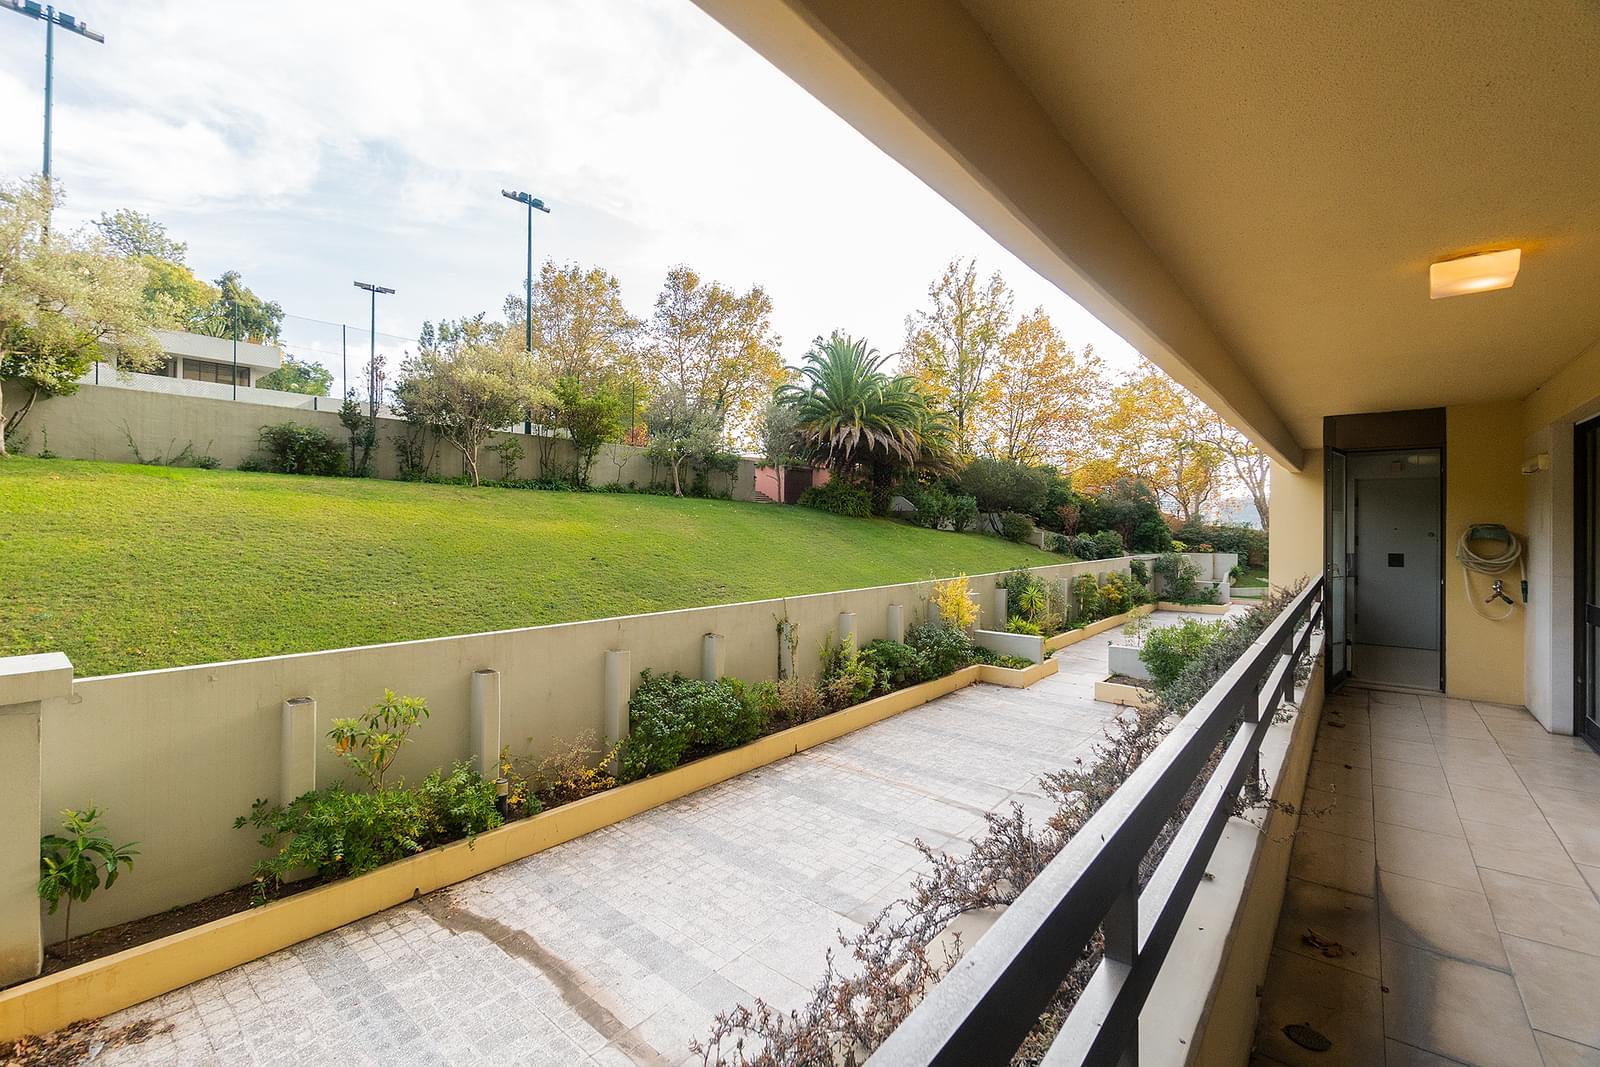 pf18551-apartamento-t3-1-lisboa-6eb12863-002f-4deb-bbd0-89d1e96a6ccd